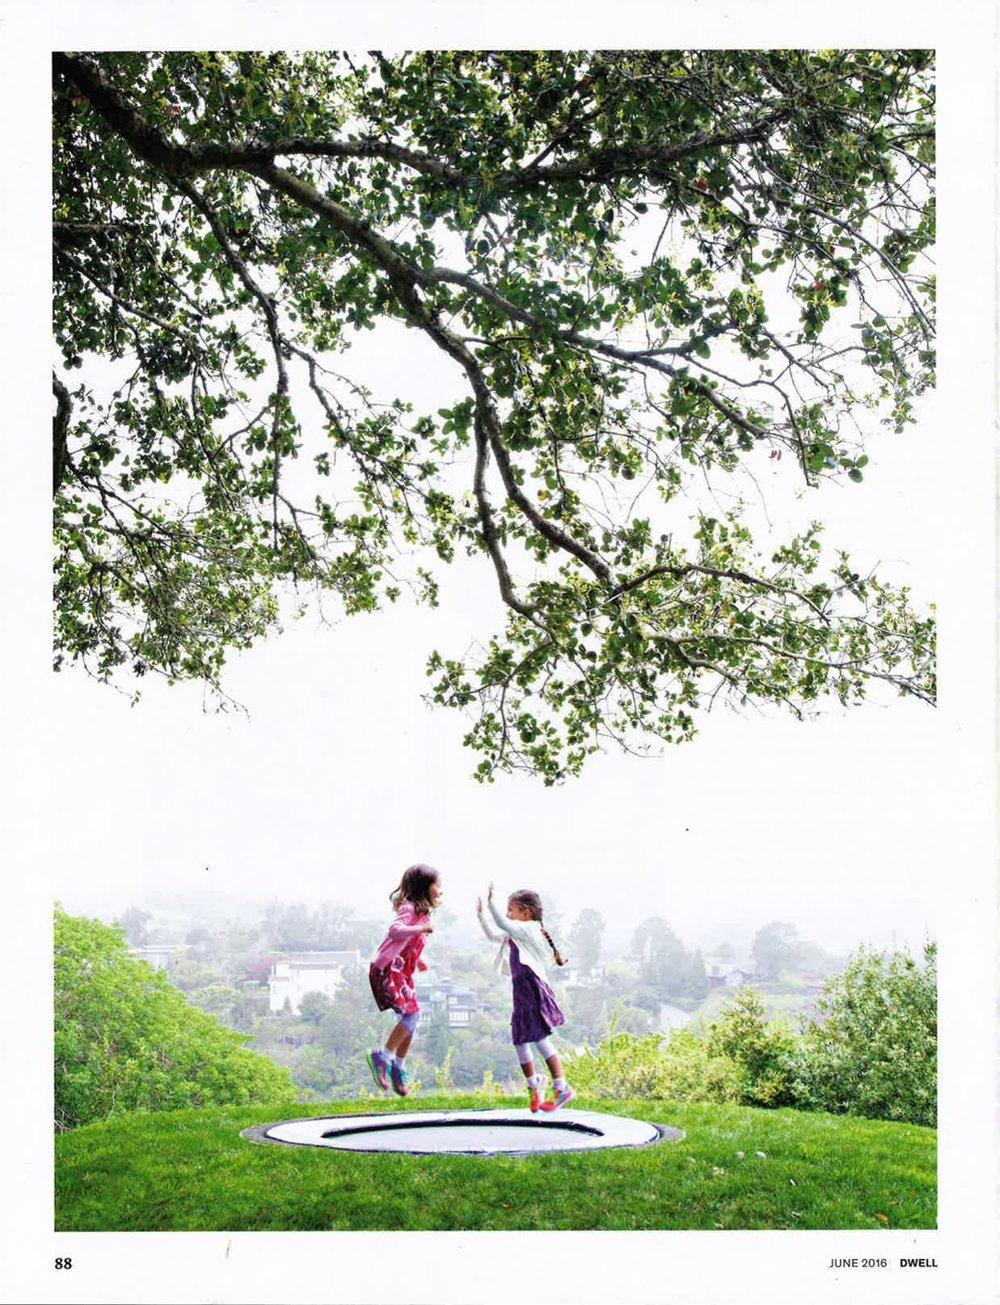 dwell magazine landscaping-05.jpg